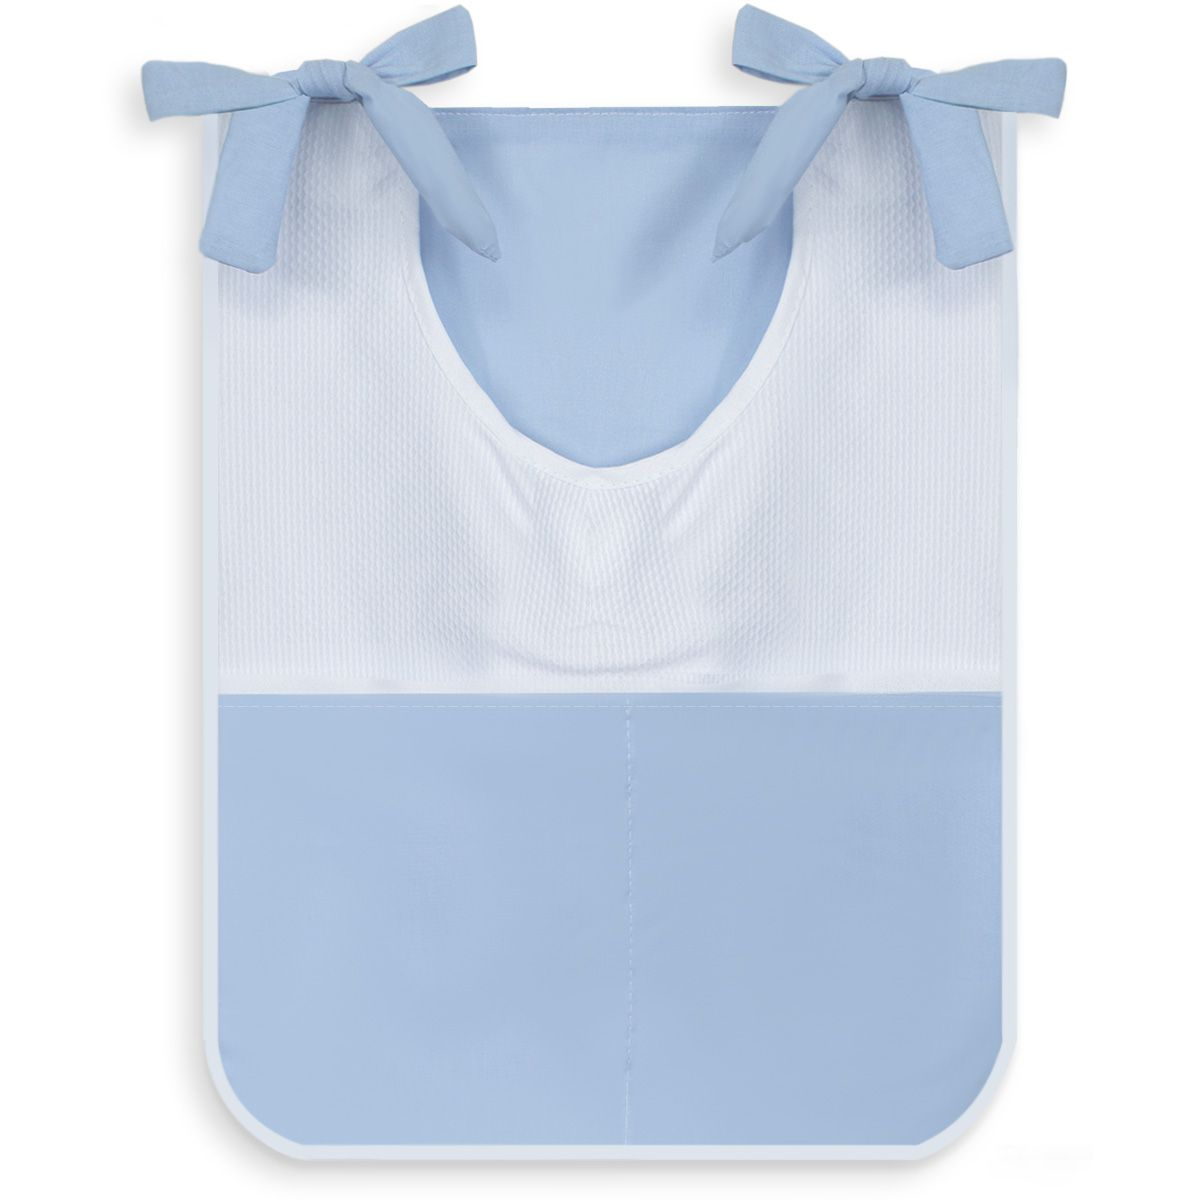 Porta Treco Individual - Azul com Branco